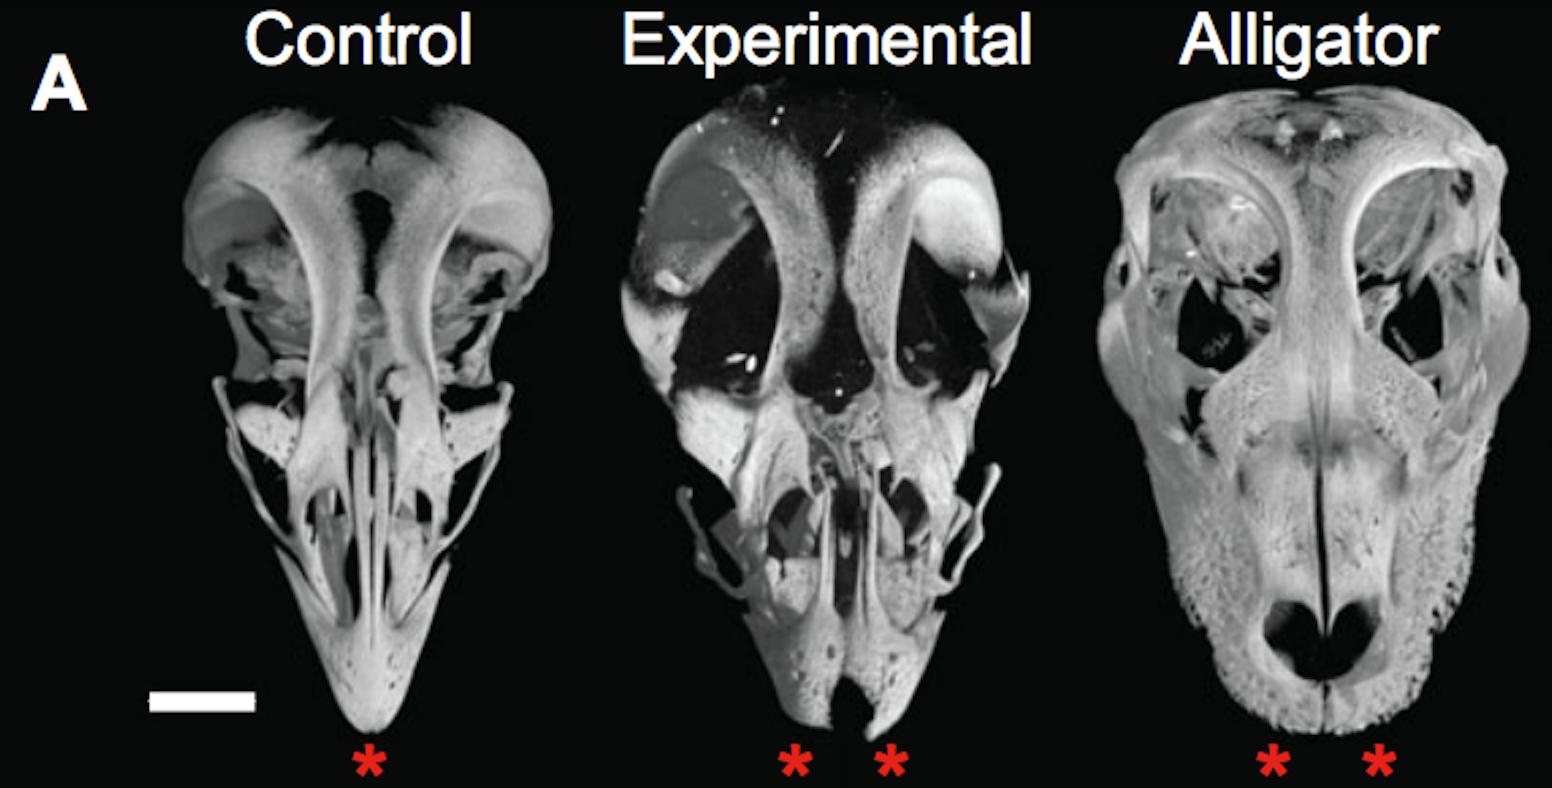 Imaged skulls of a chicken, Bhullar et al.'s experimental chicken, and an alligator.